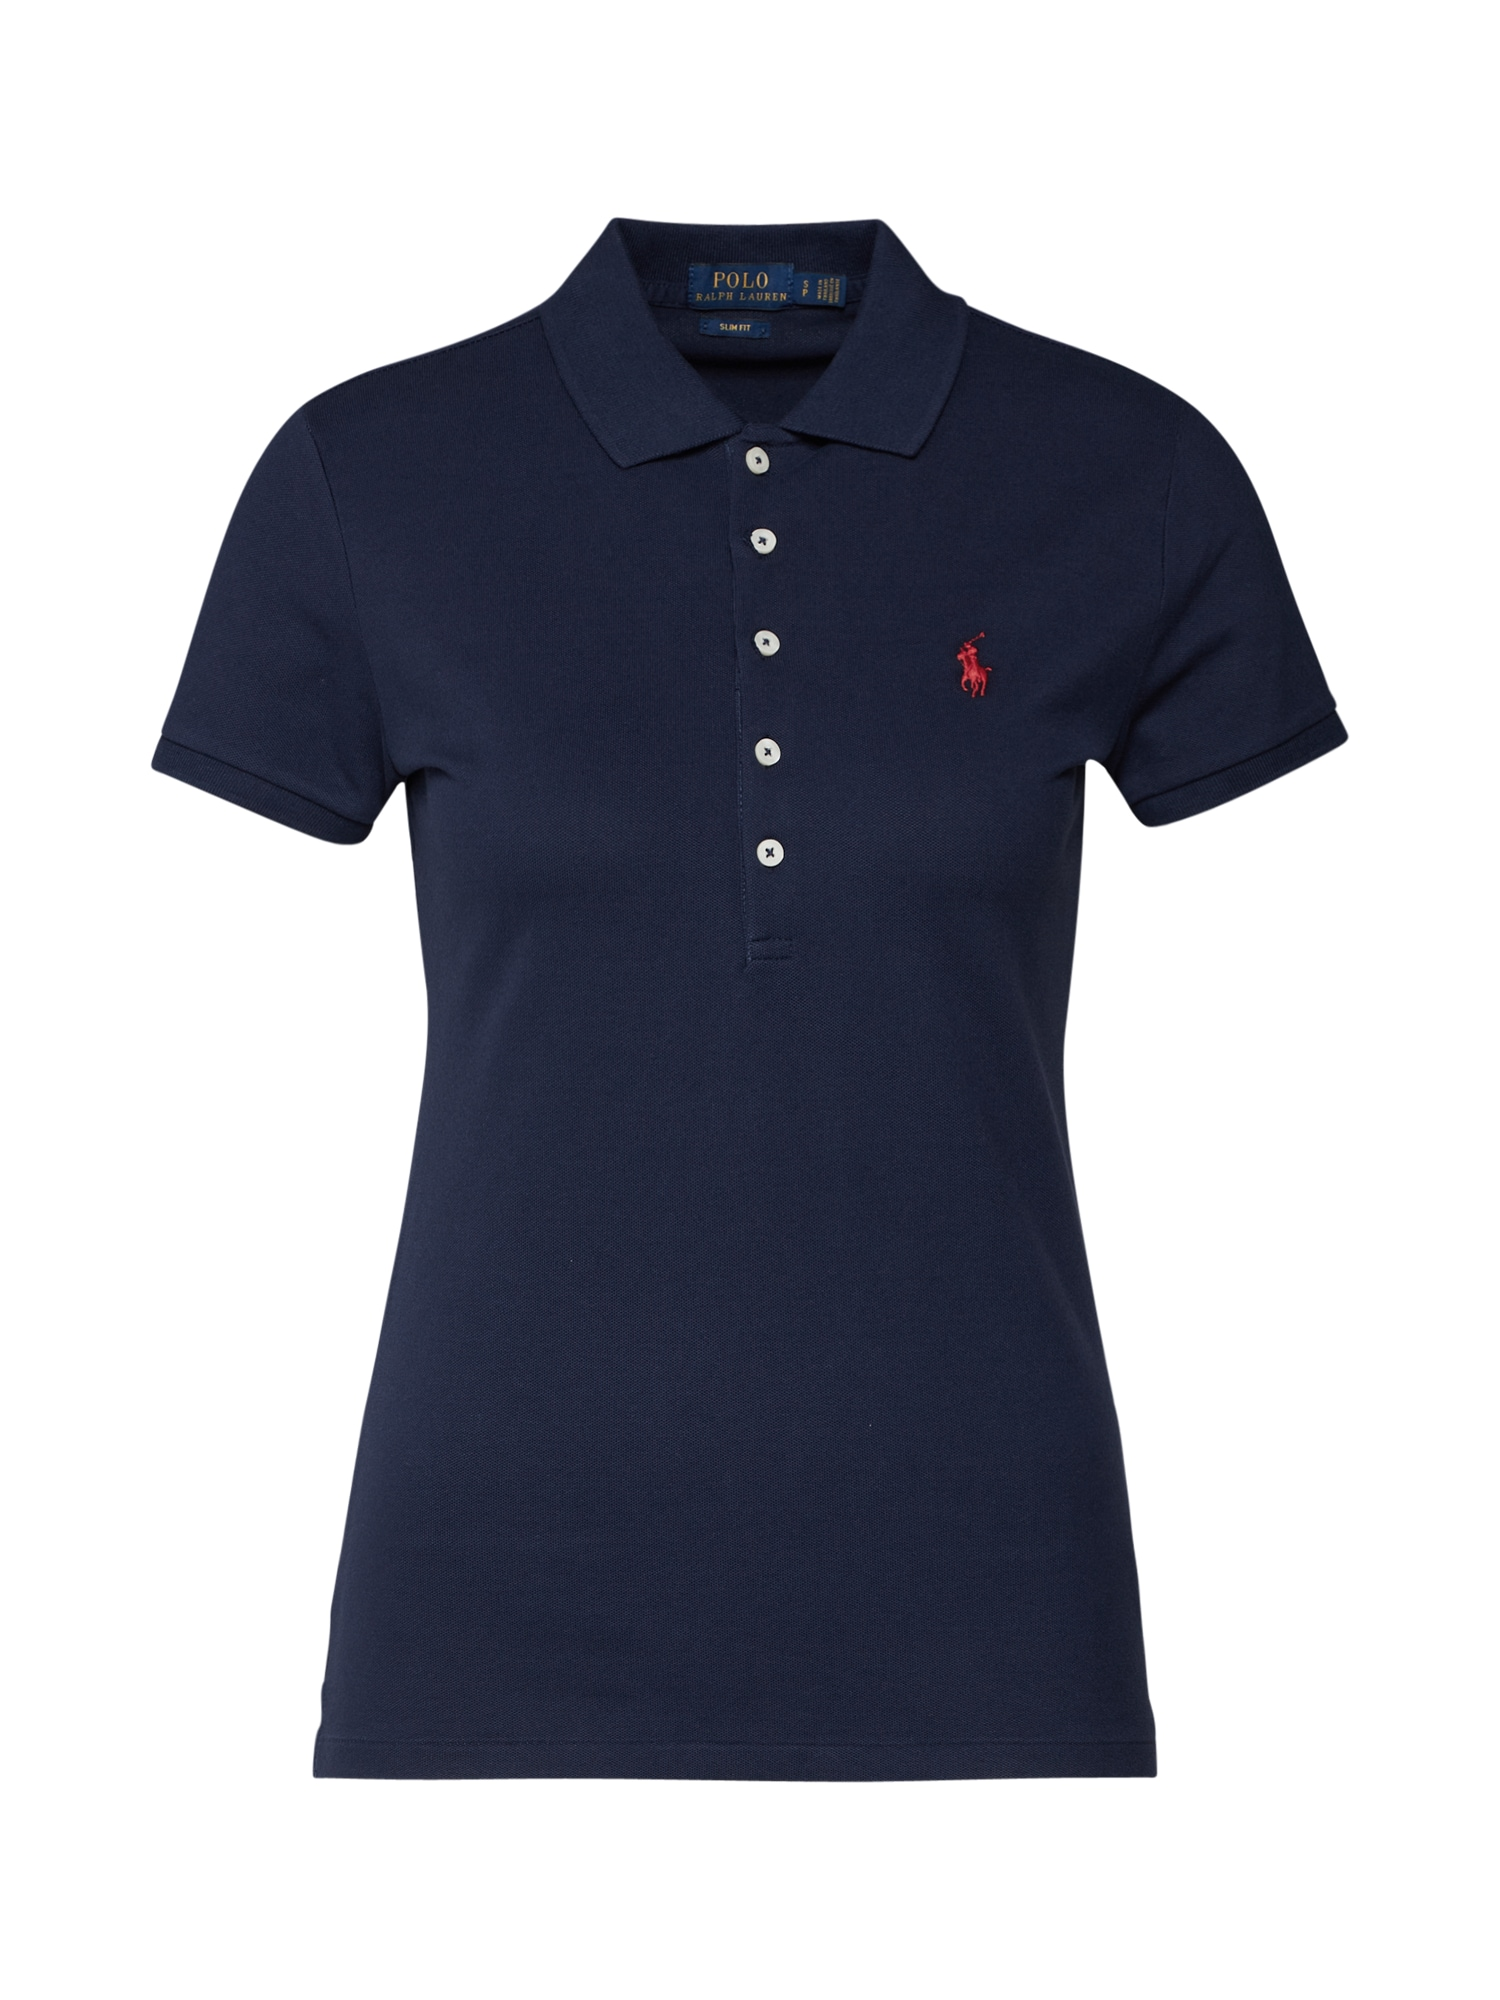 POLO RALPH LAUREN Marškinėliai 'JULIE' tamsiai mėlyna